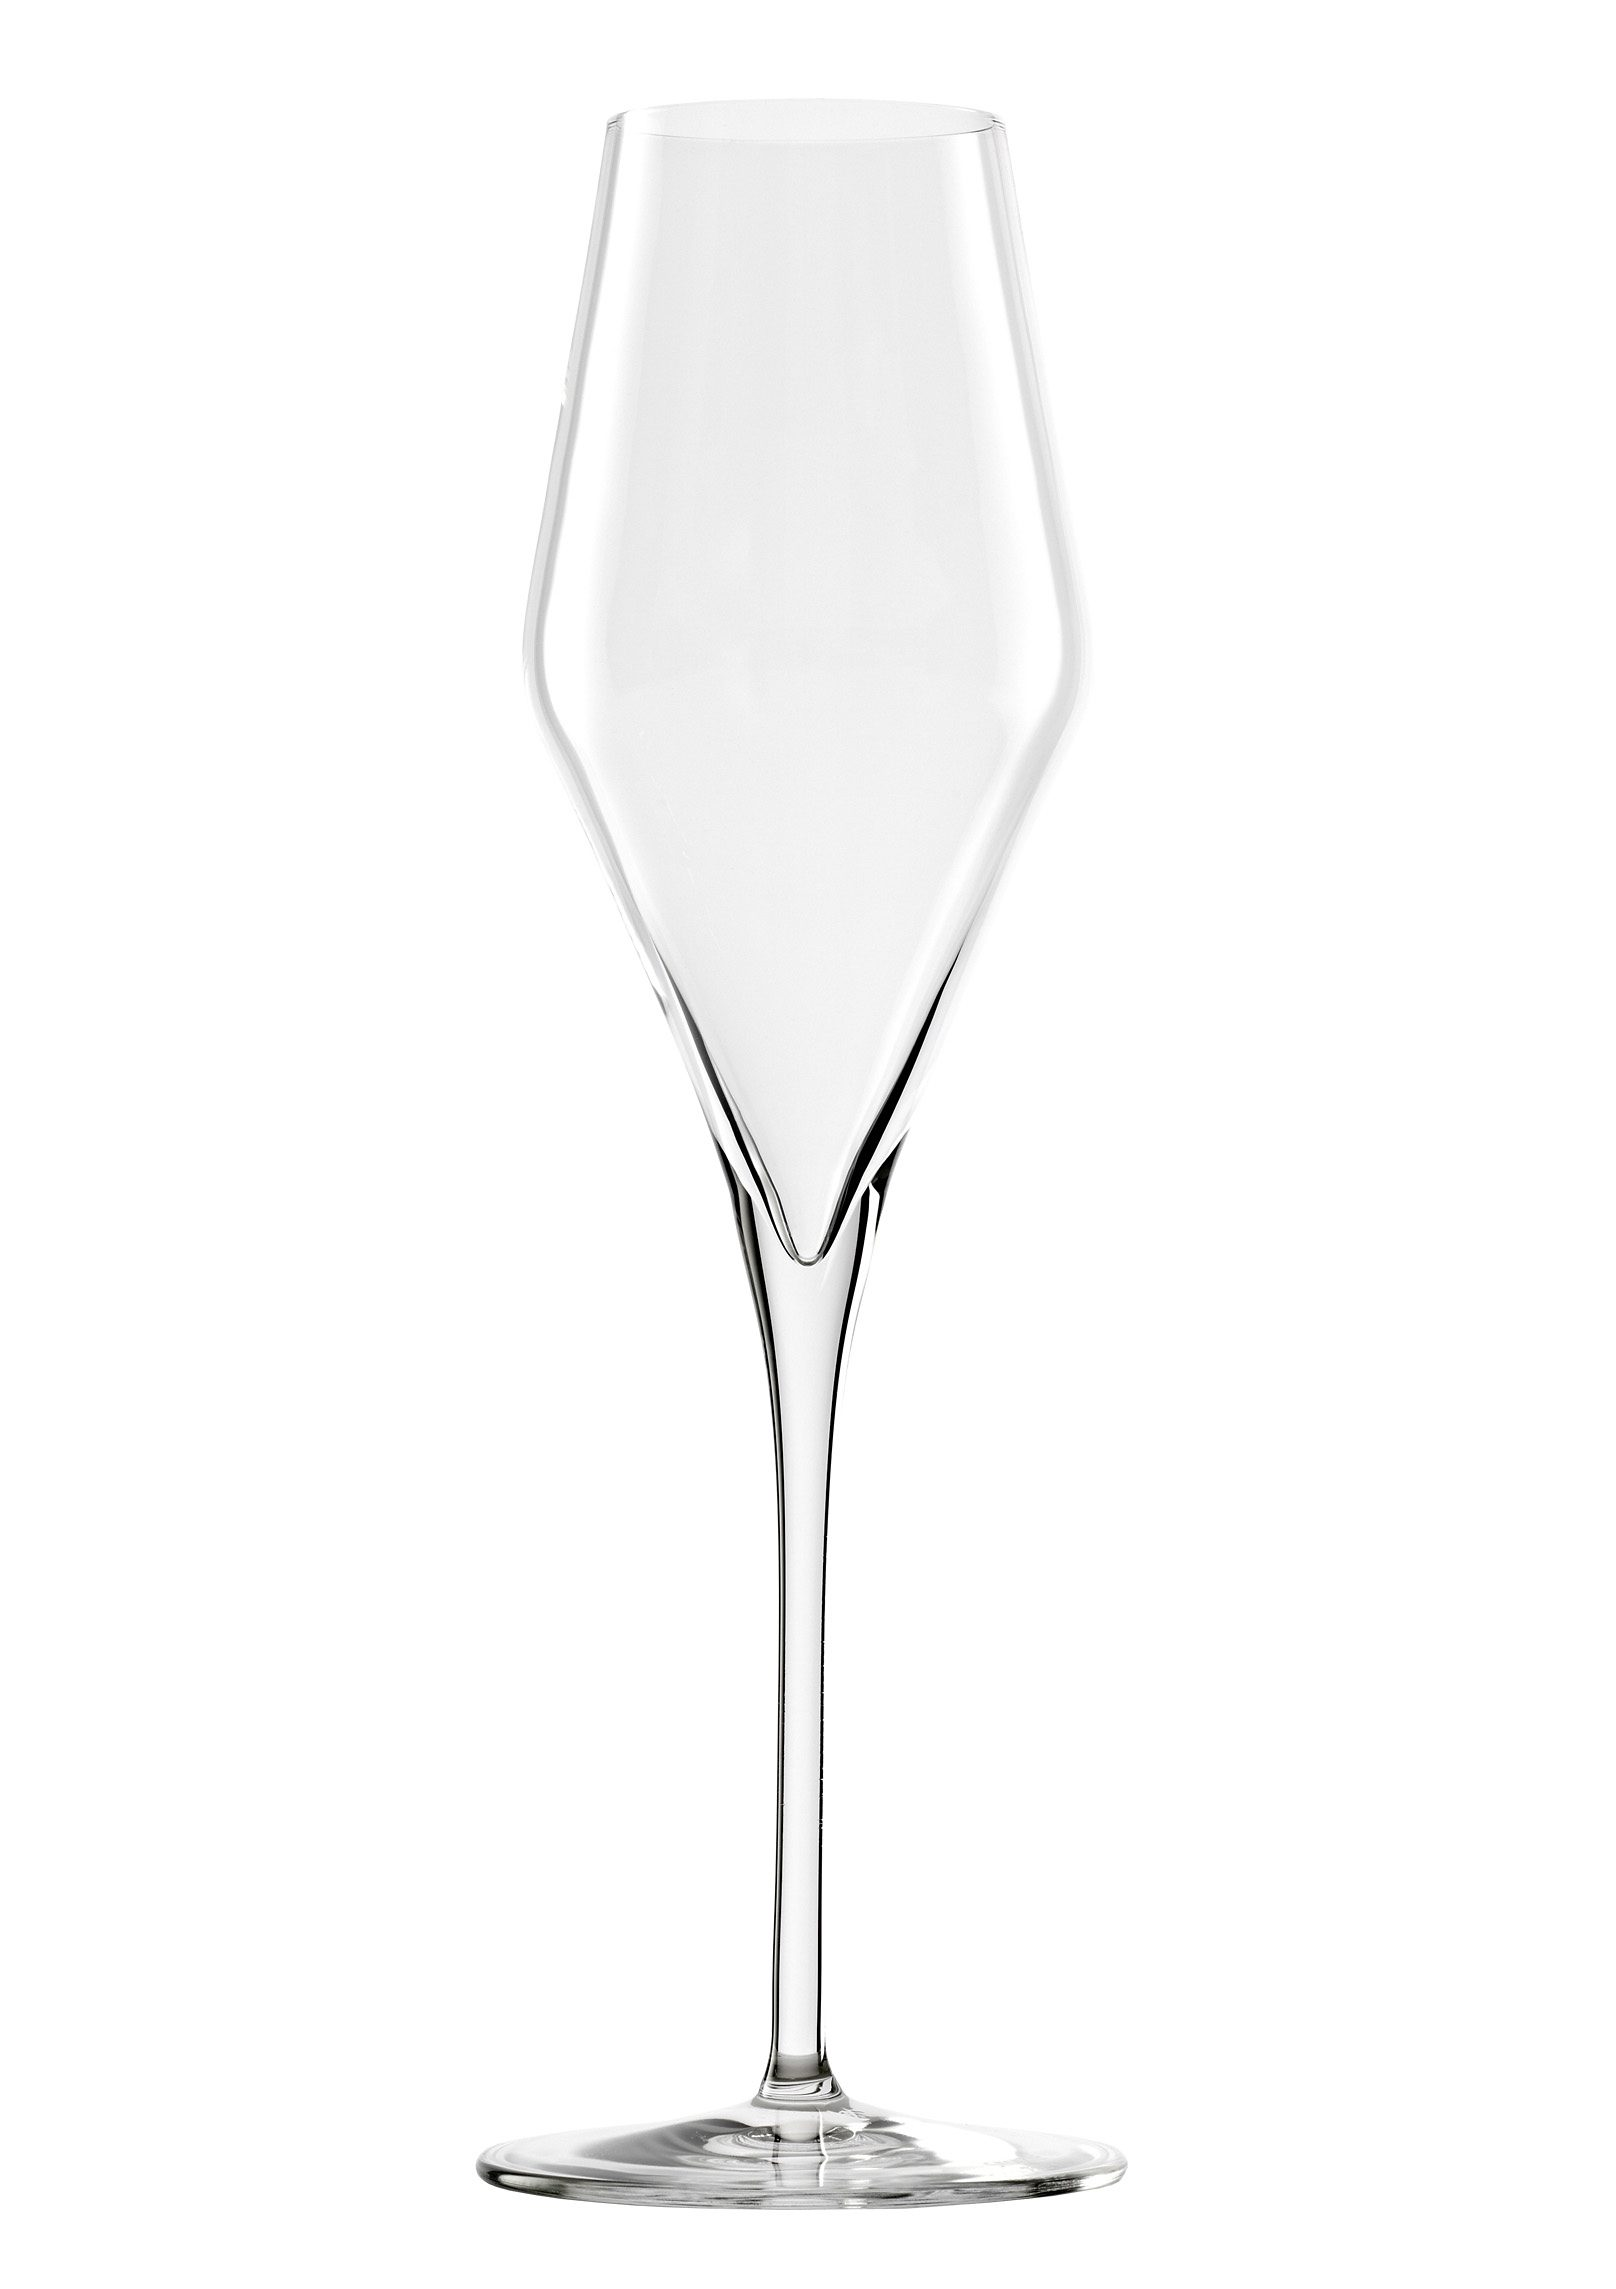 Stölzle Champagnerglas QUATROPHIL, (Set, 6 tlg.) farblos Kristallgläser Gläser Glaswaren Haushaltswaren